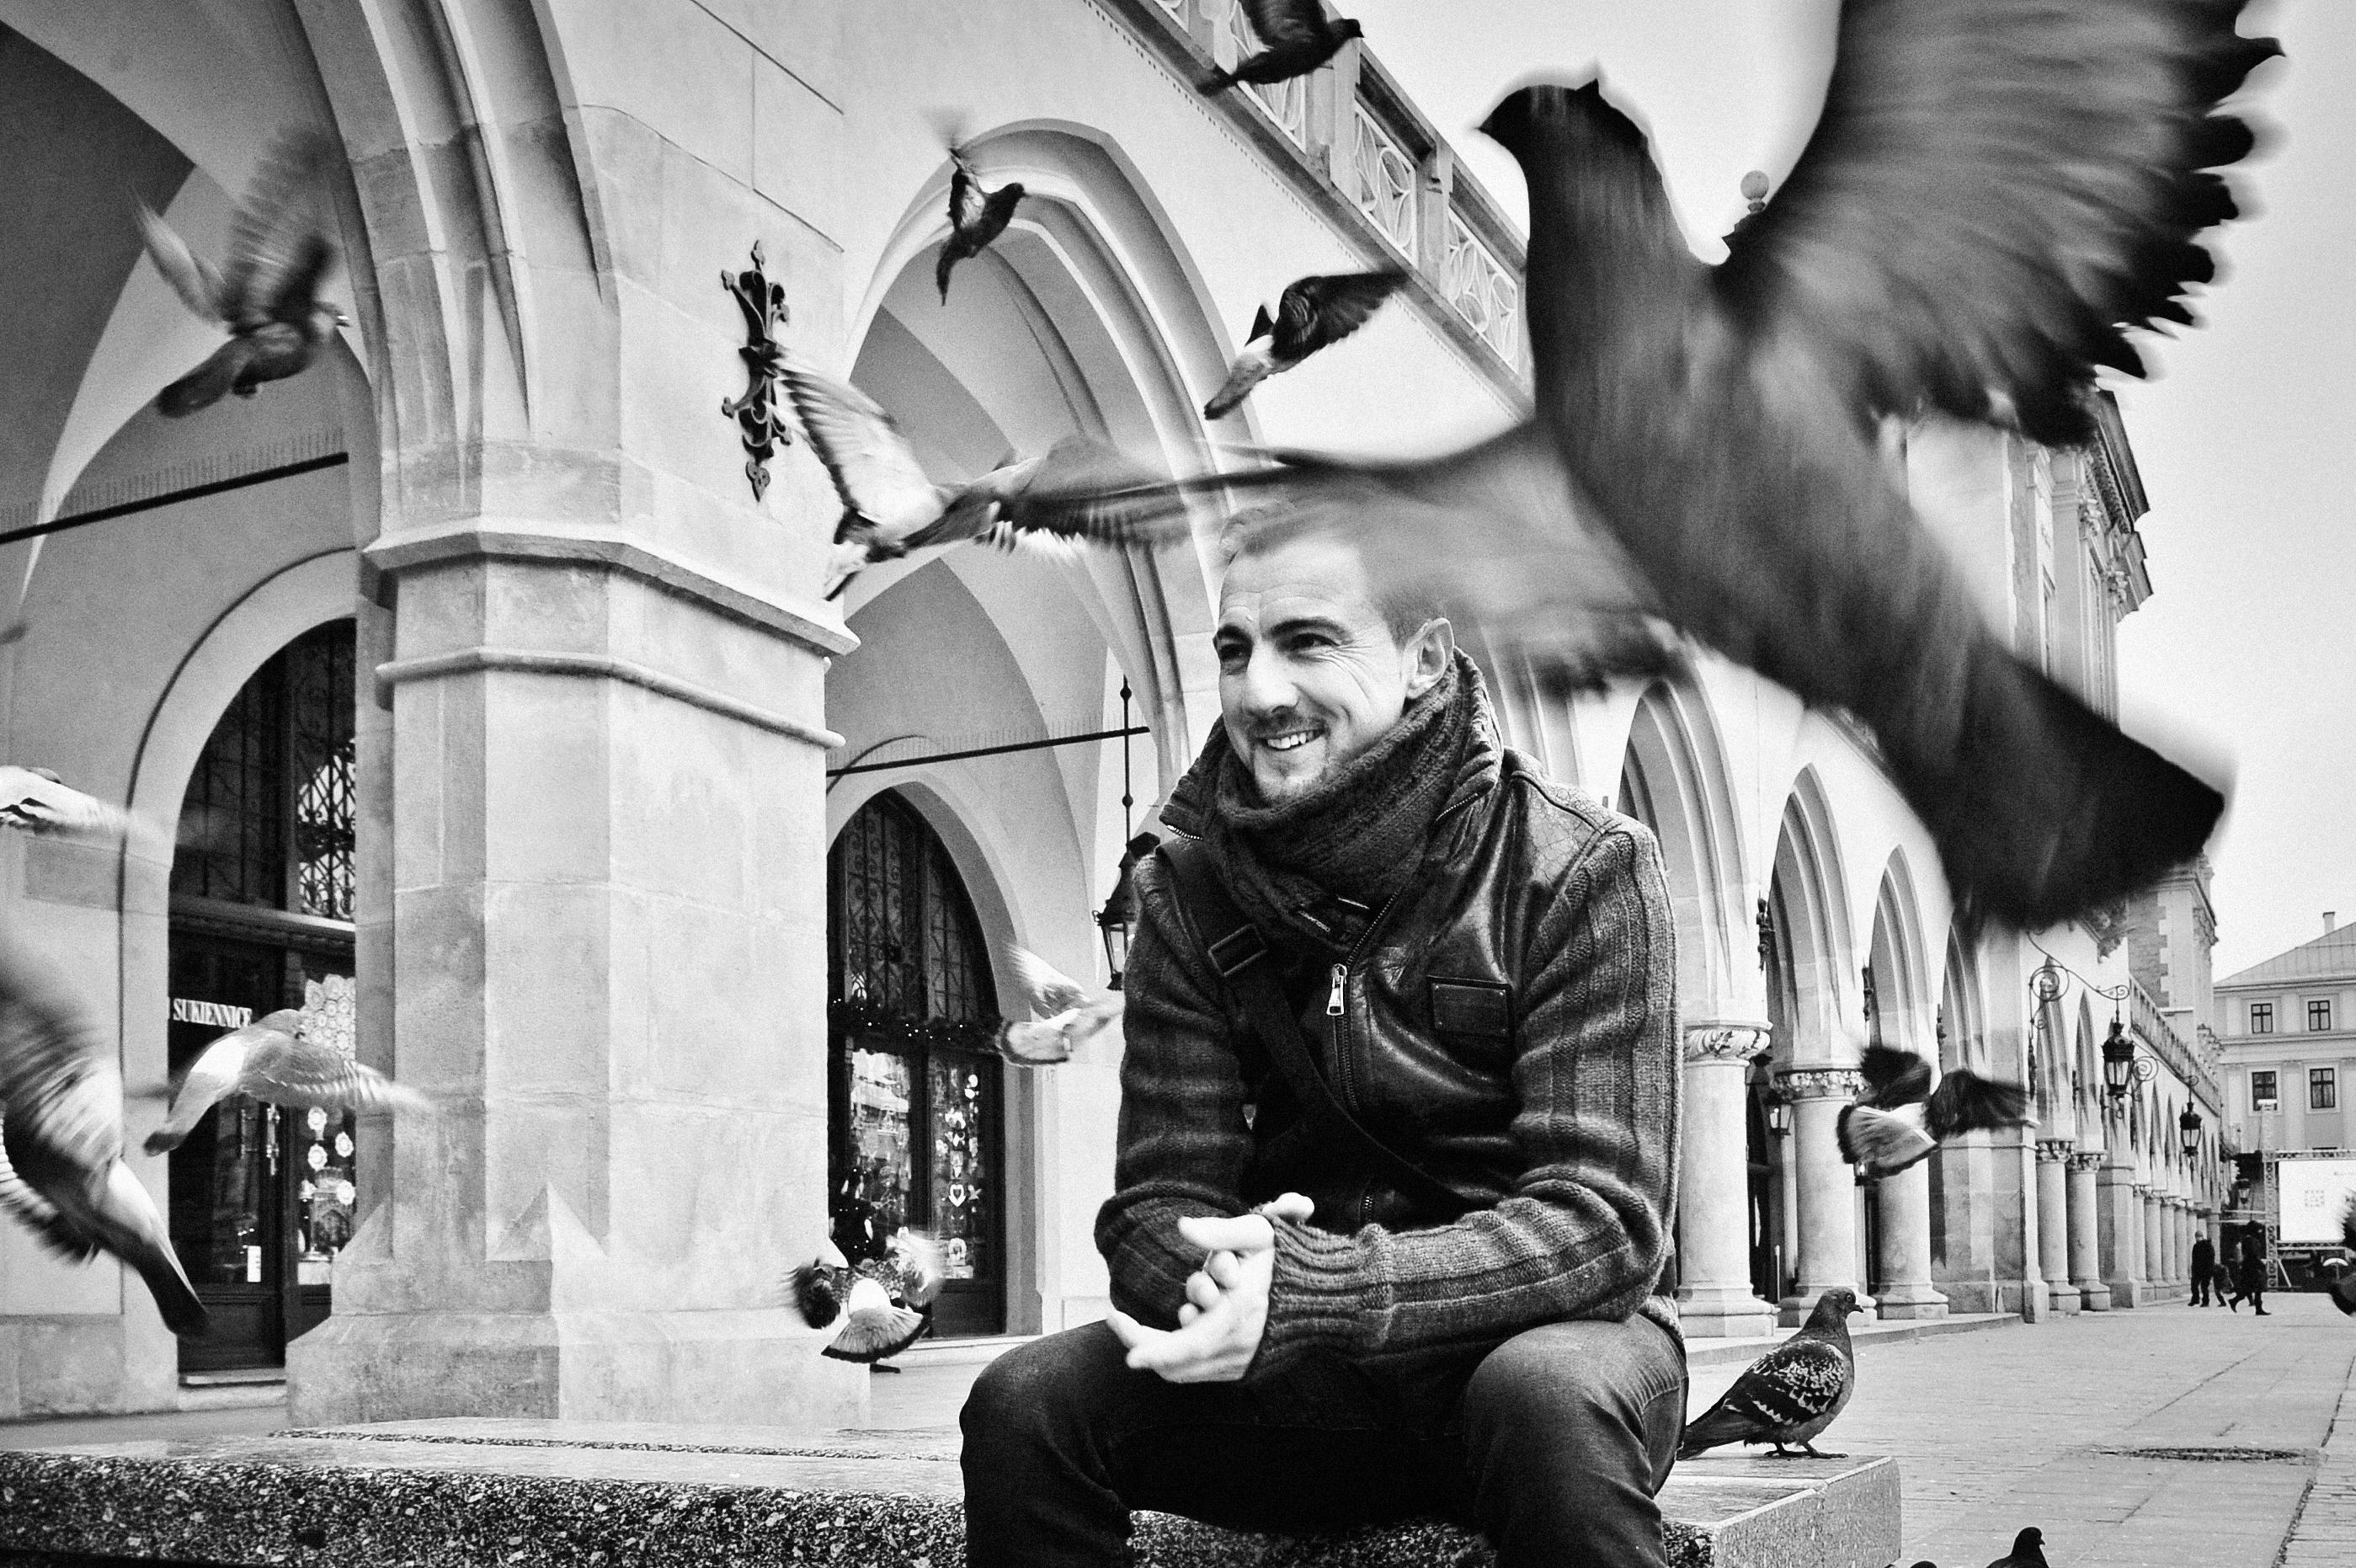 JERZY JUREK DUDEK fot. OLSZANKA